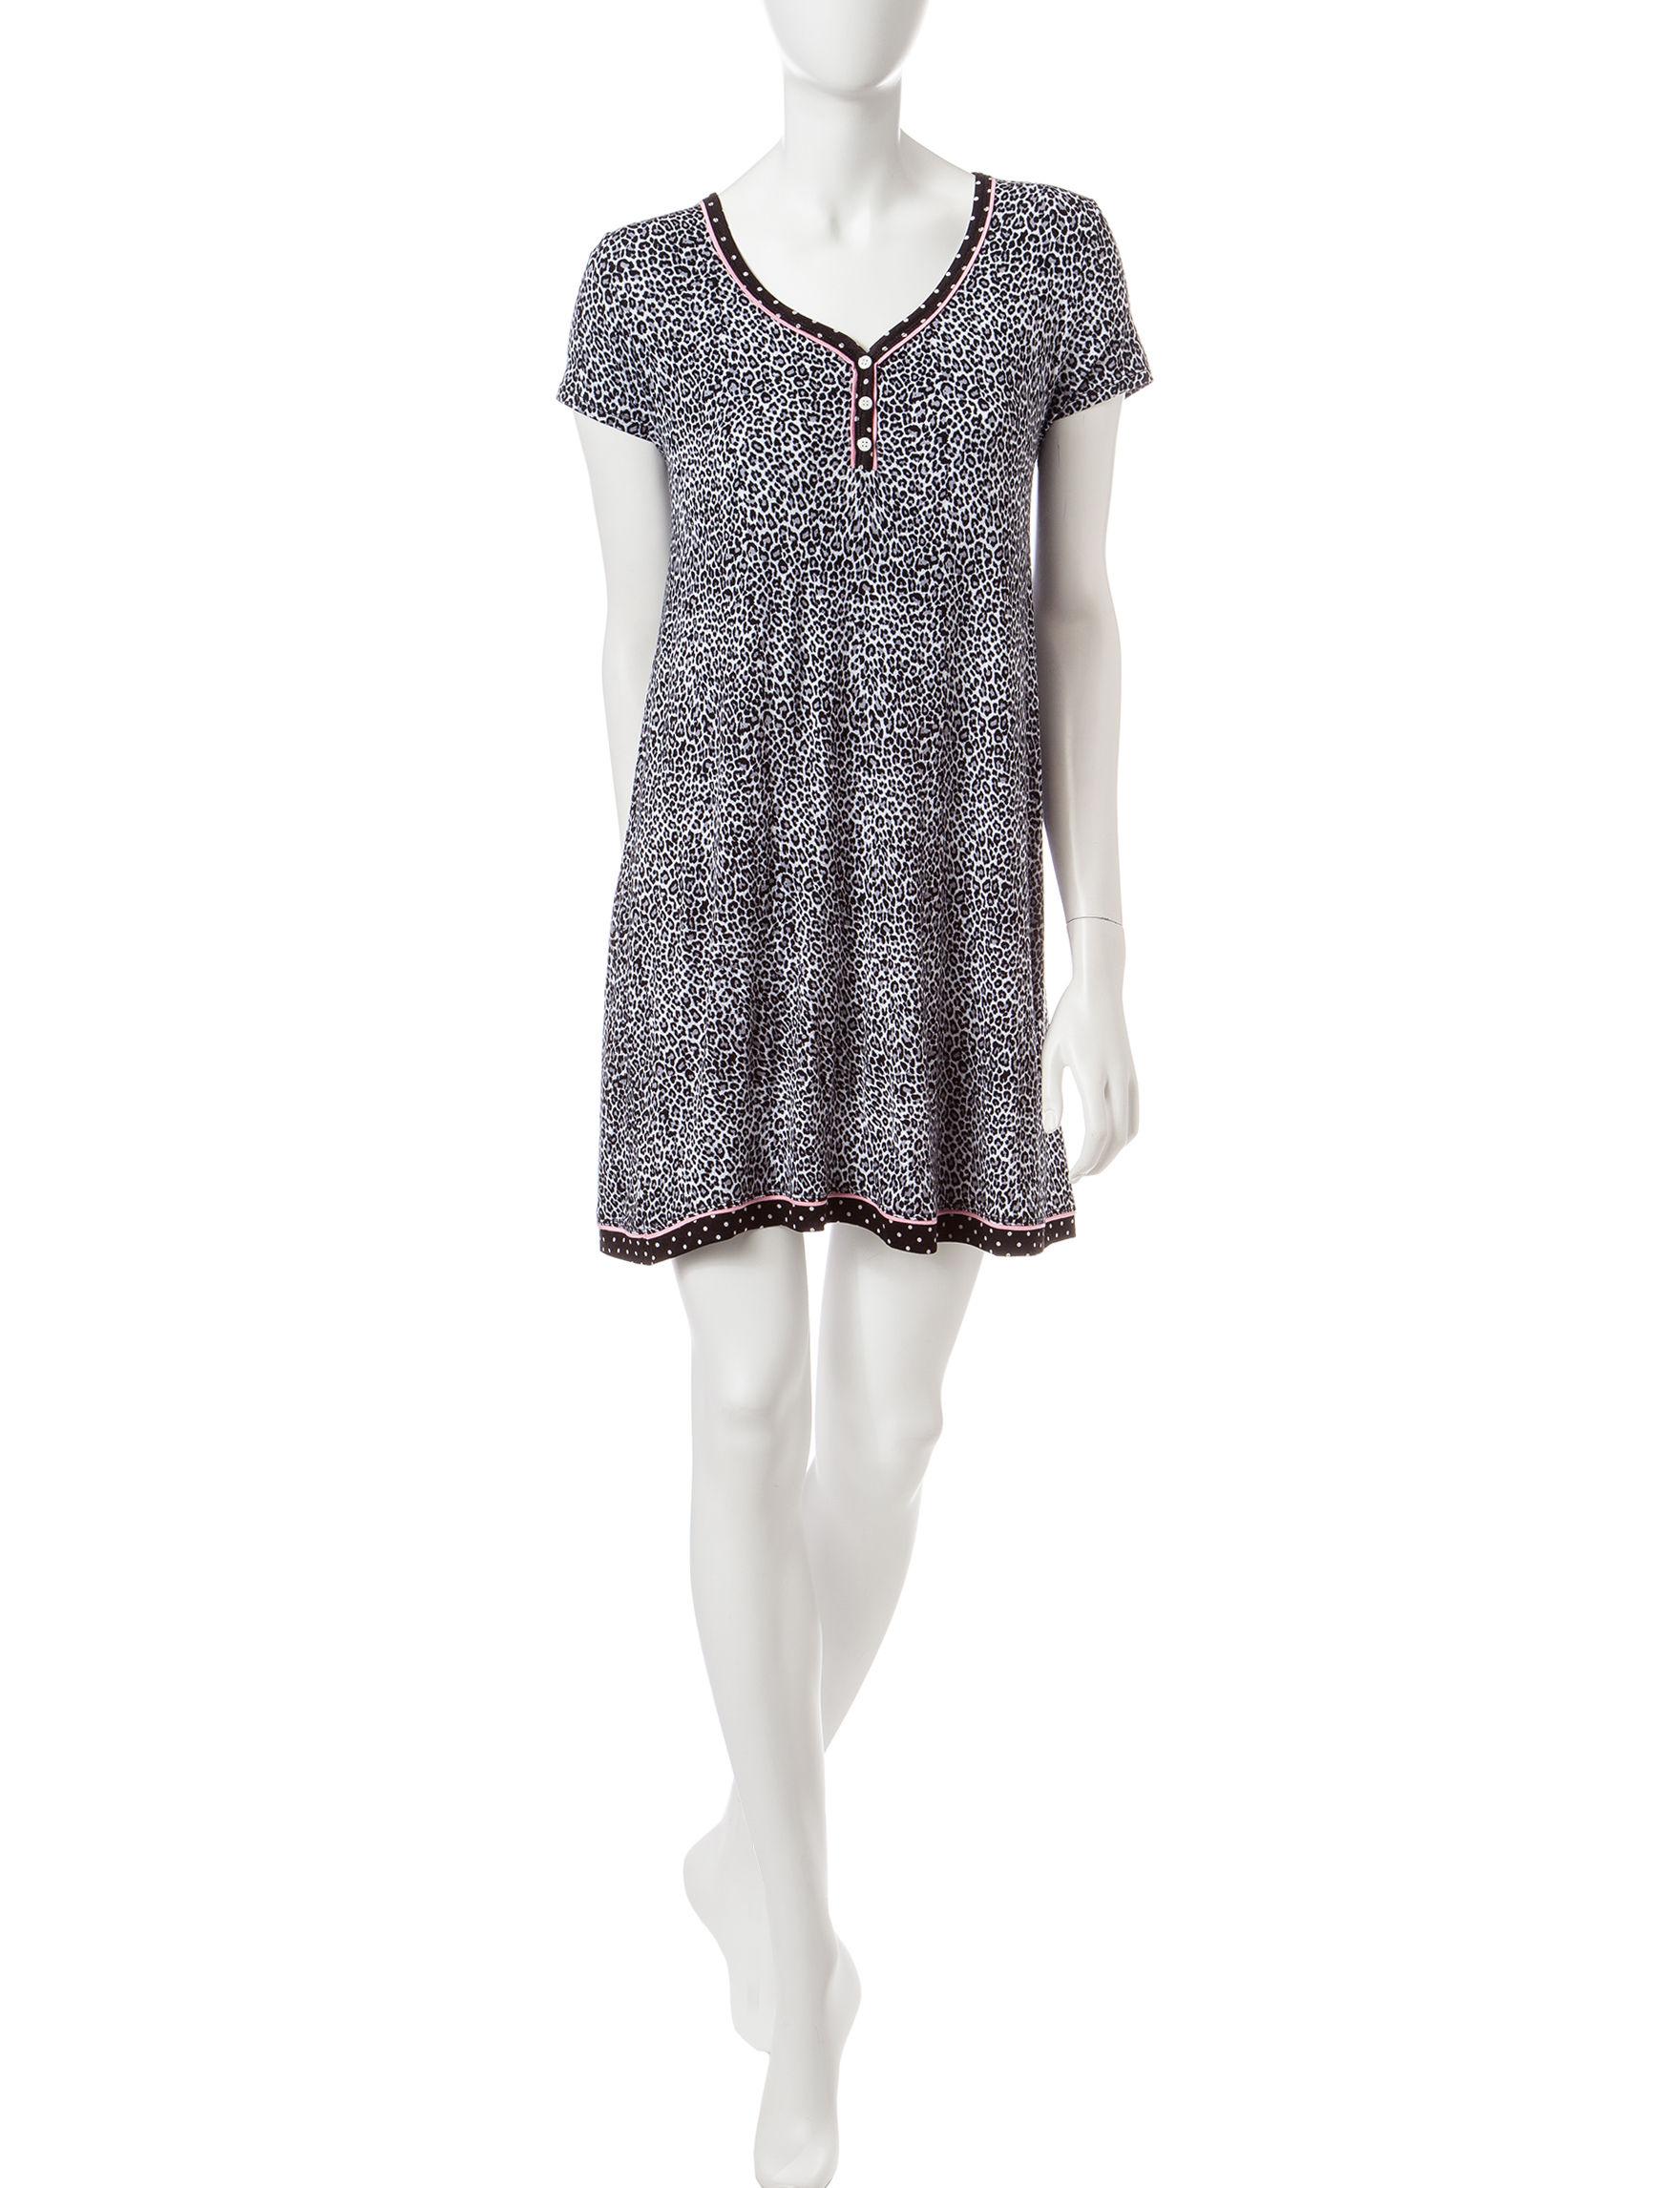 Rene Rofe Animal Print Nightgowns & Sleep Shirts